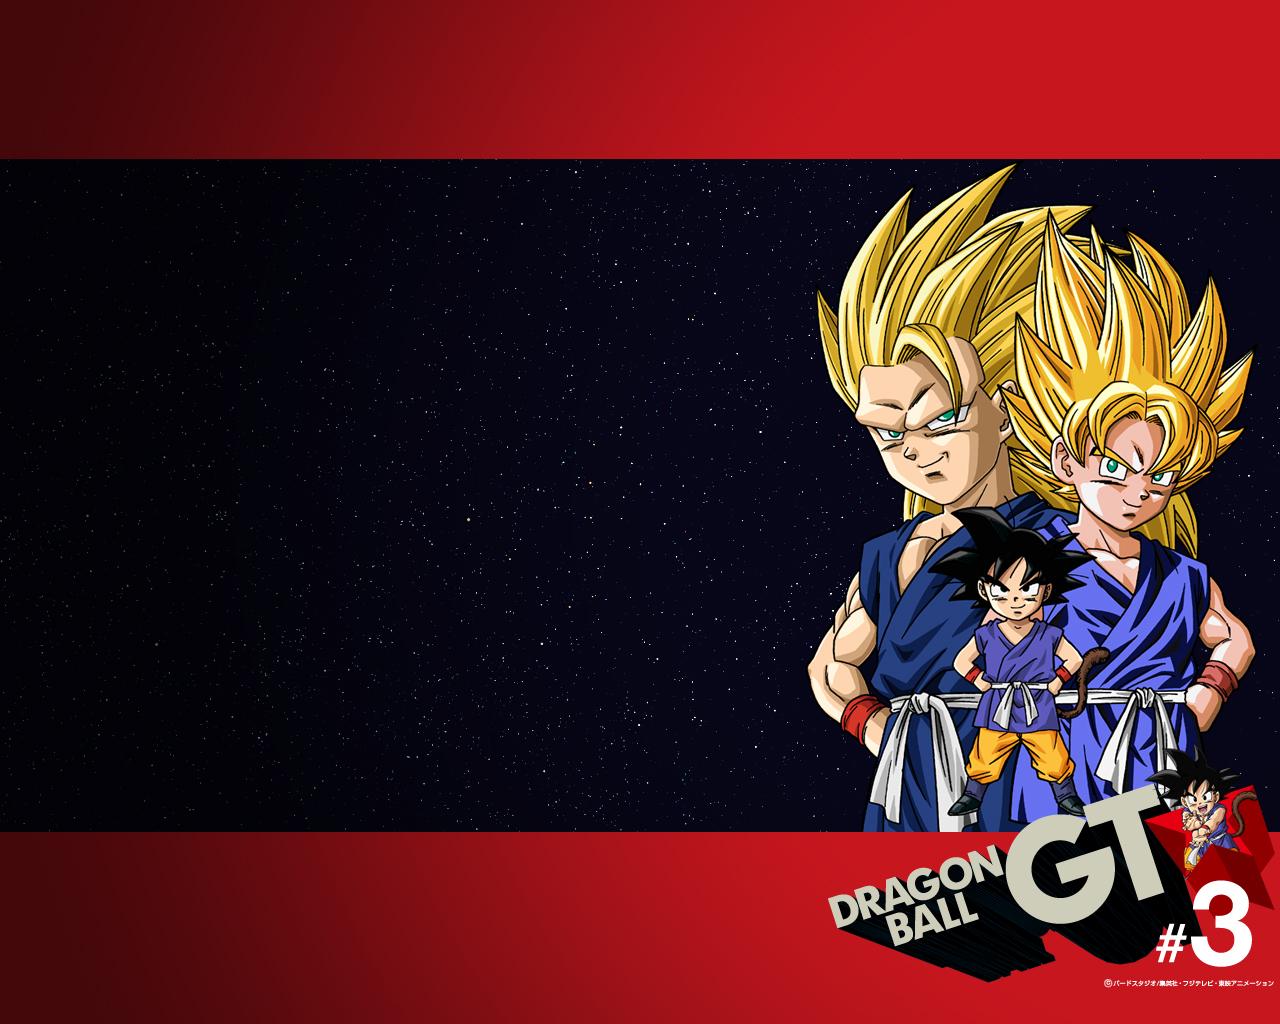 Free Download Dragon Ball Z Wallpapers Son Goku Apps Directories 1280x1024 For Your Desktop Mobile Tablet Explore 71 Goku Gt Wallpapers Goku Gt Wallpapers Goku Backgrounds Goku Wallpaper